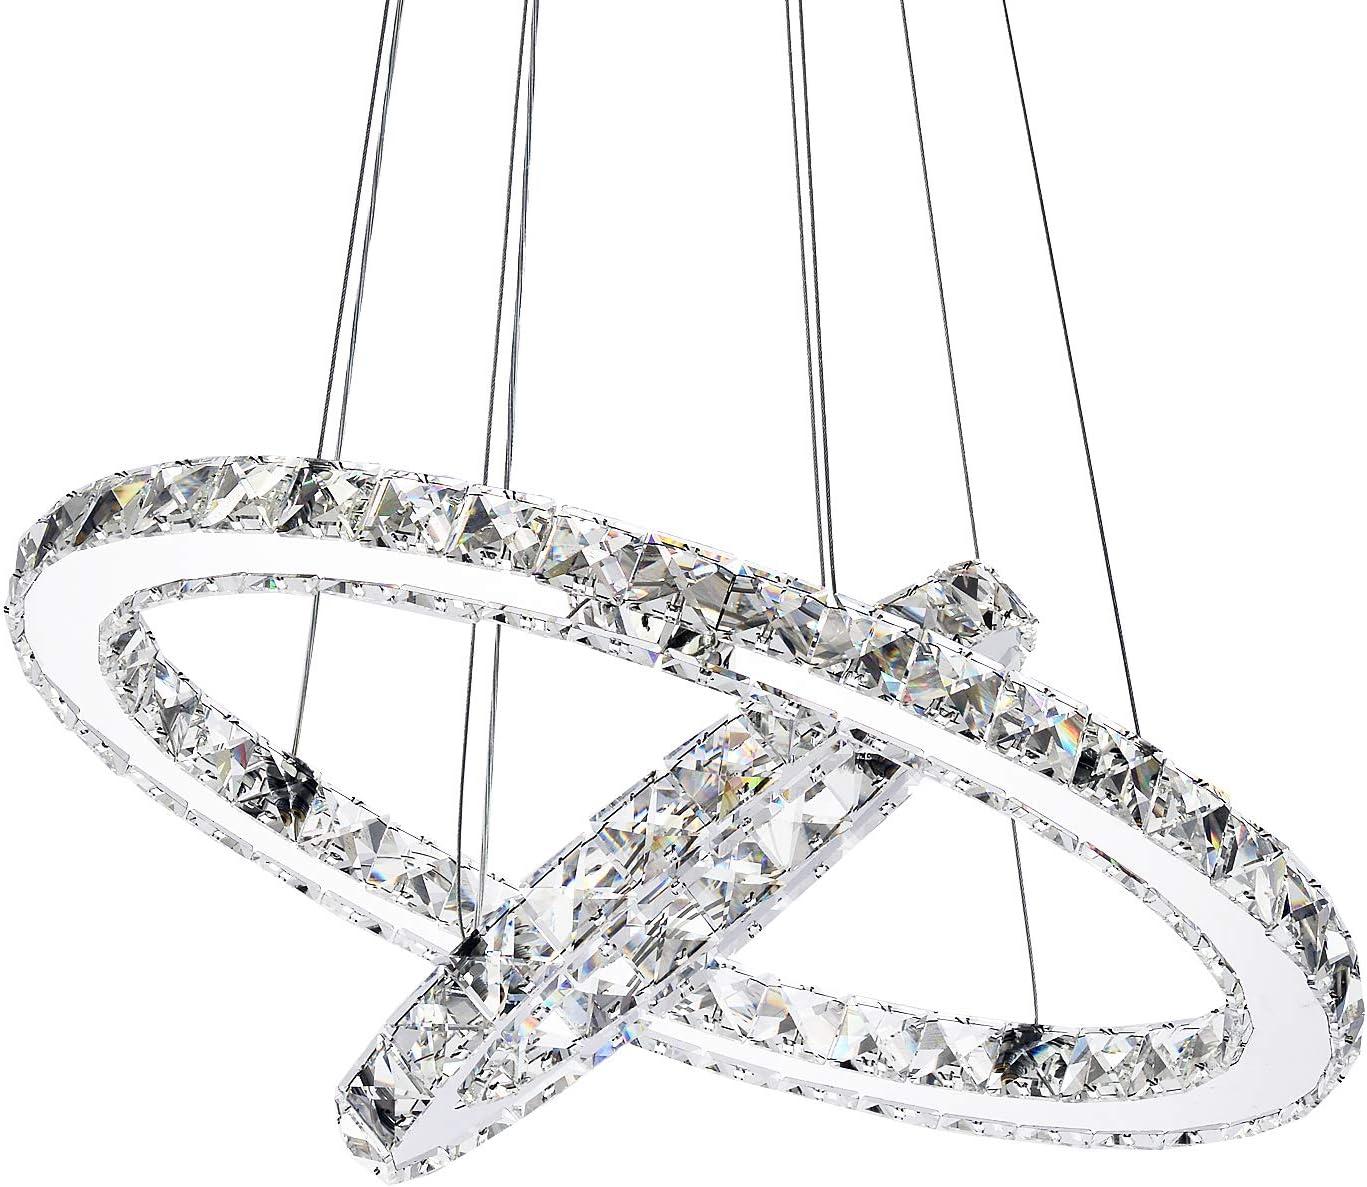 Garwarm Modern Crystal Chandeliers,Ceiling Lights Fixtures,Pendant Lighting for Living Room Bedroom Restaurant Porch Dining Room,2 Rings DIY Design D19.7 11.8